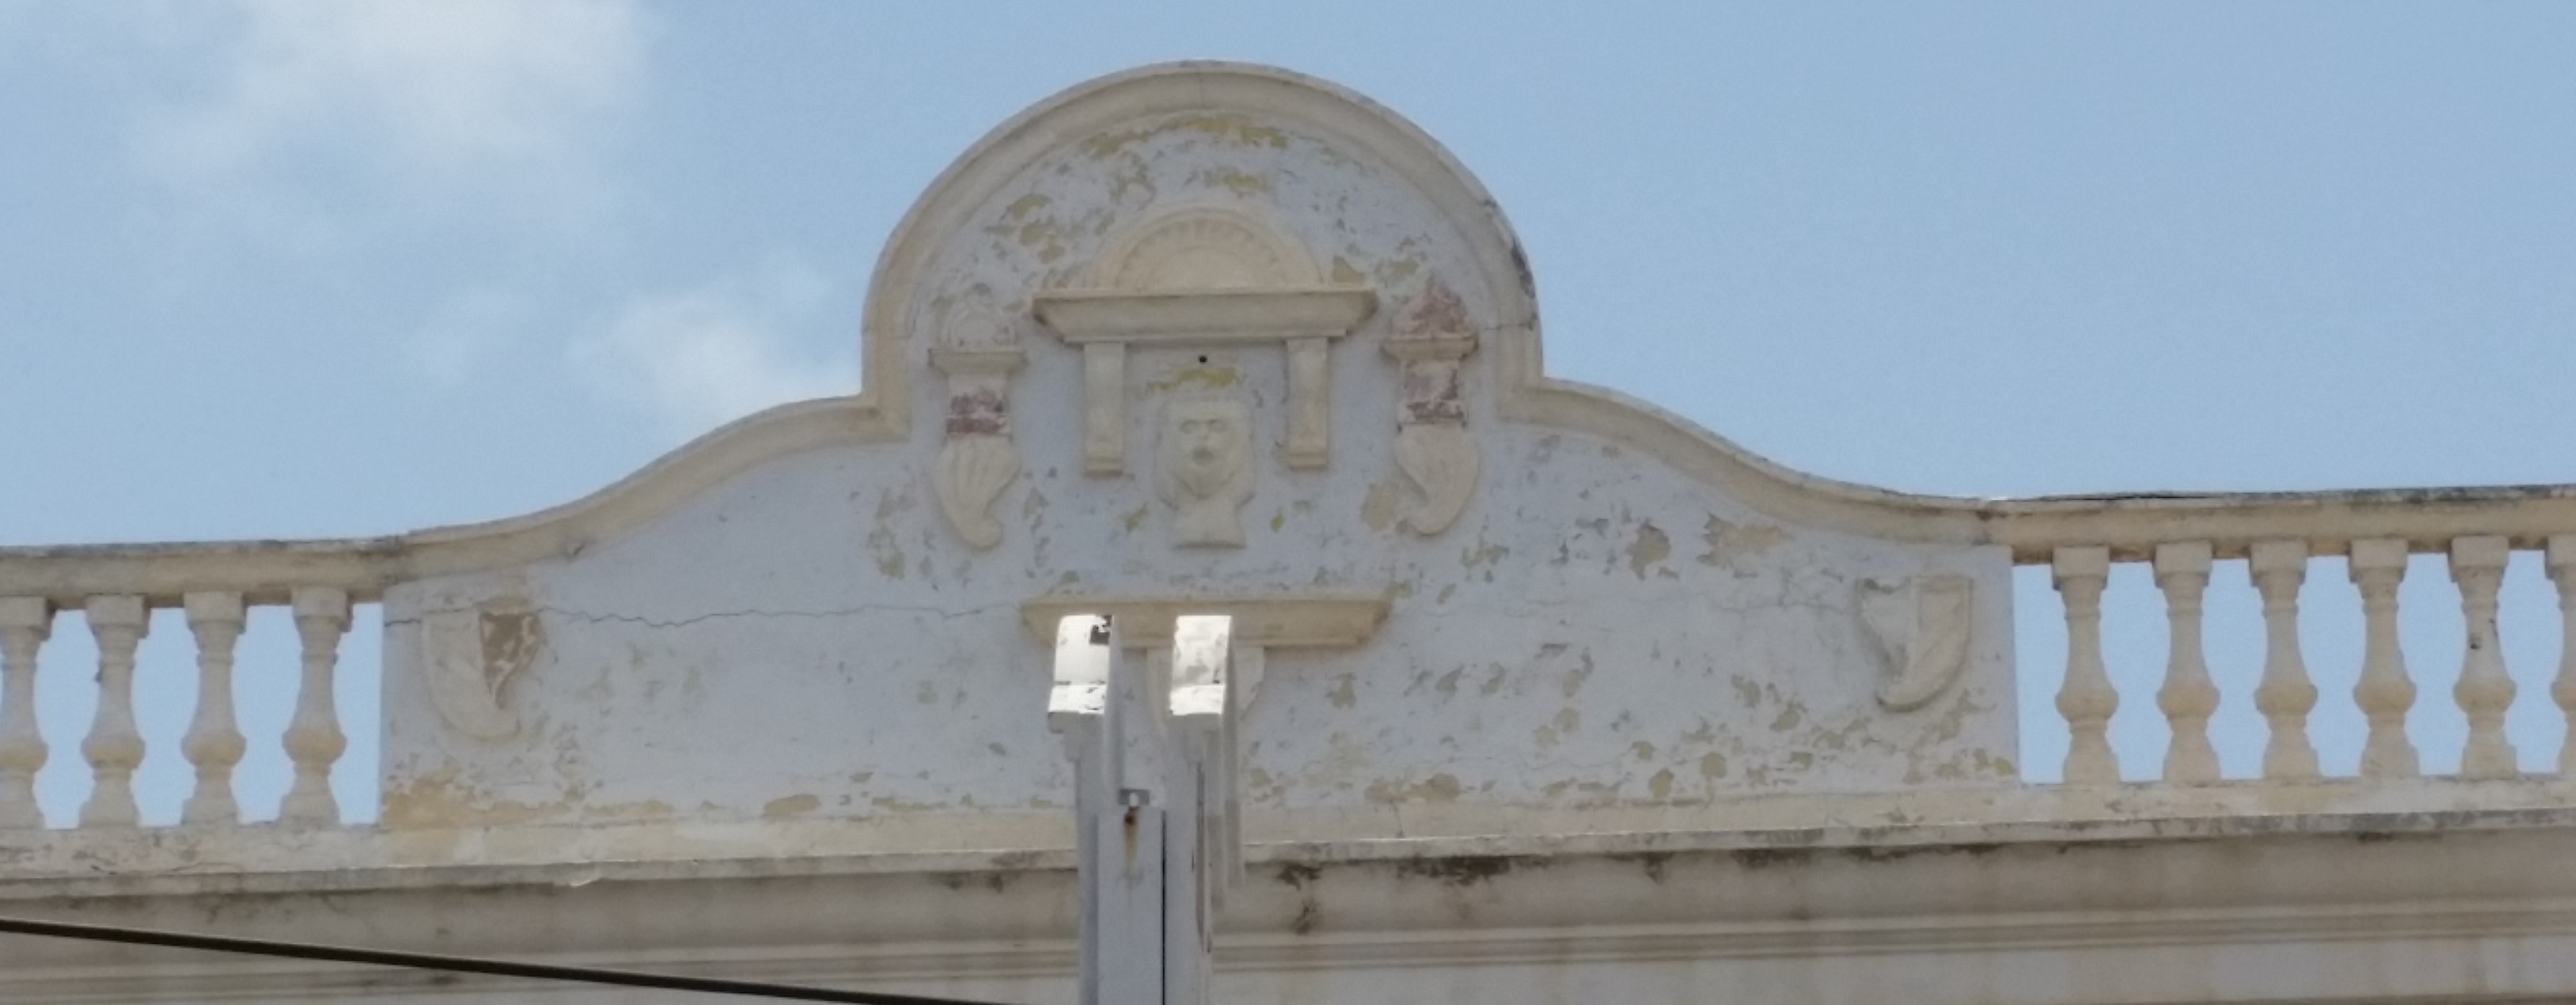 Botica Aruba roof detail